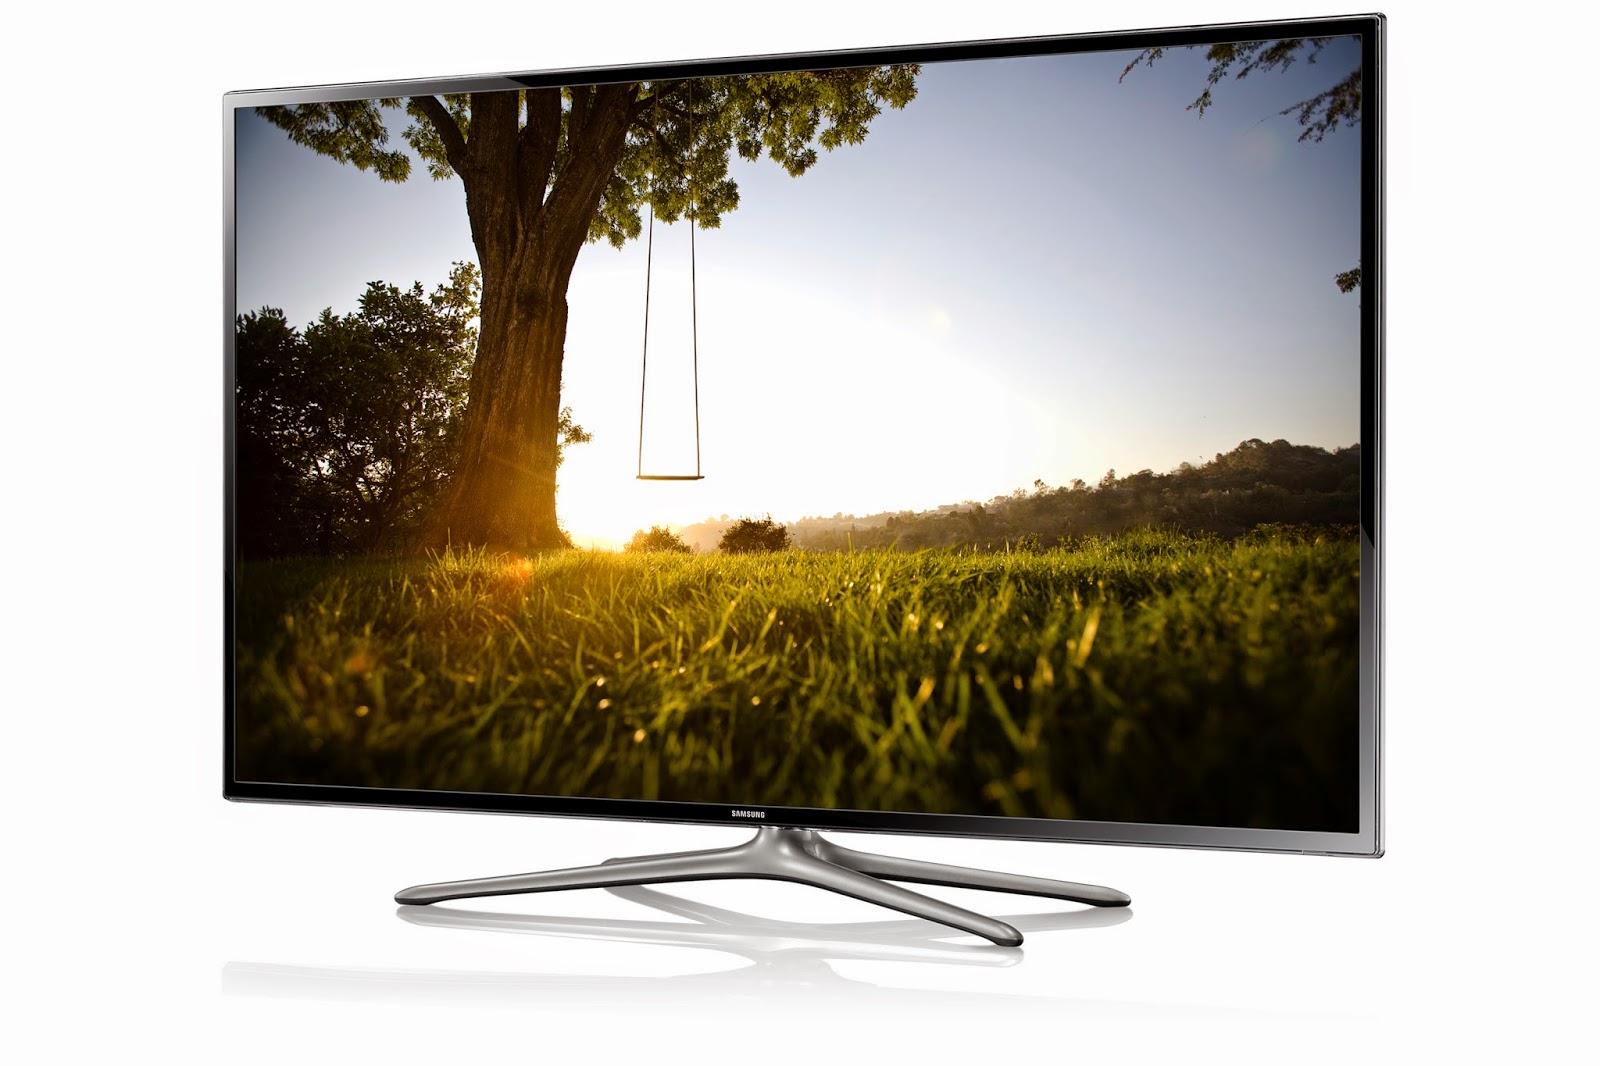 Tv smart led reiniciando sozinha resolvido tecnologia e cozinha tv smart led reiniciando sozinha resolvido fandeluxe Image collections